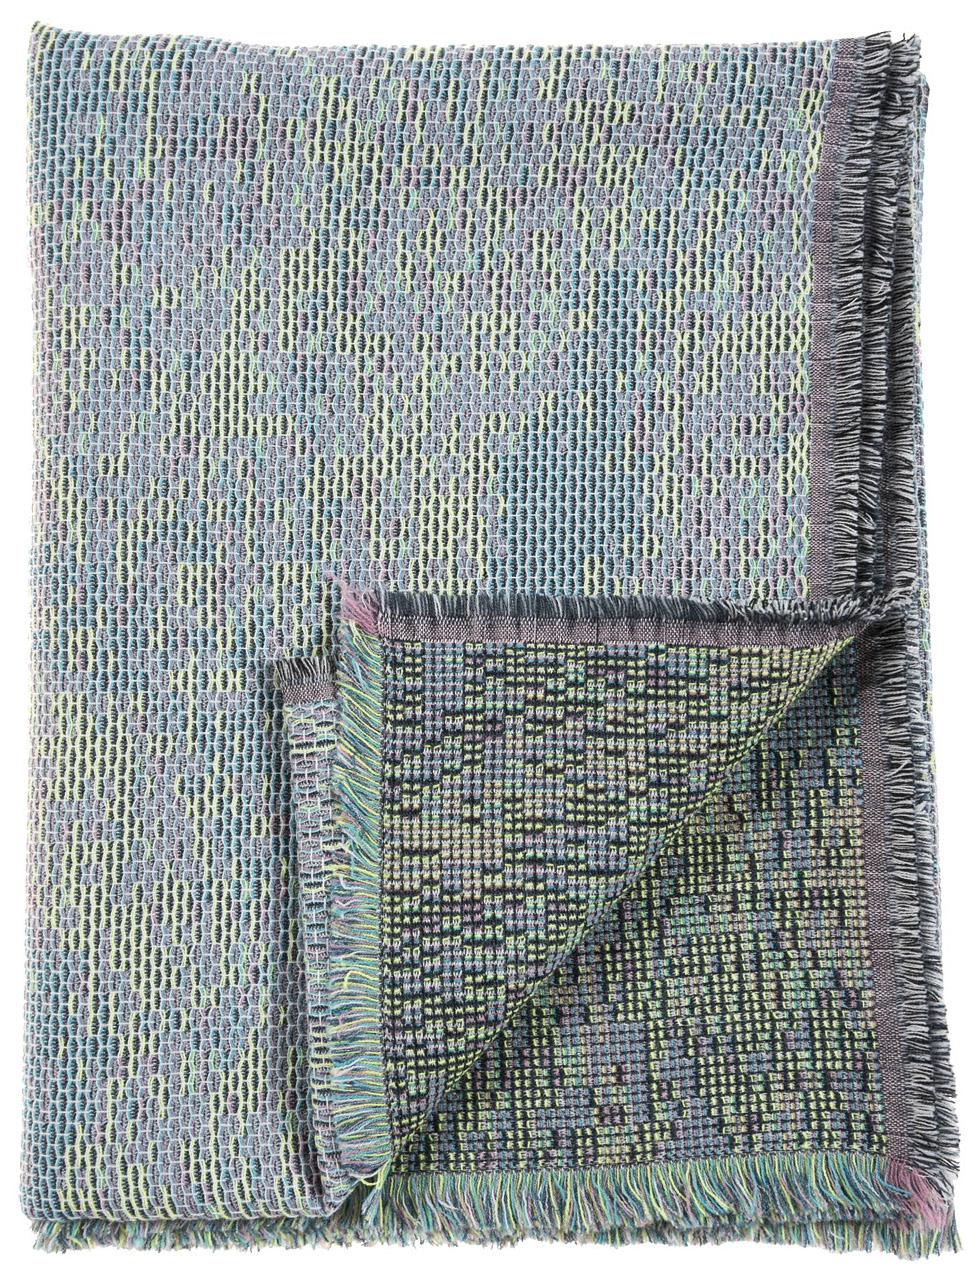 Reflet/ blue- mini throw/plaid≅ 142 x 110 cm  Composition: jacquard woven fabric 78% wool 16% viscose 6% silk